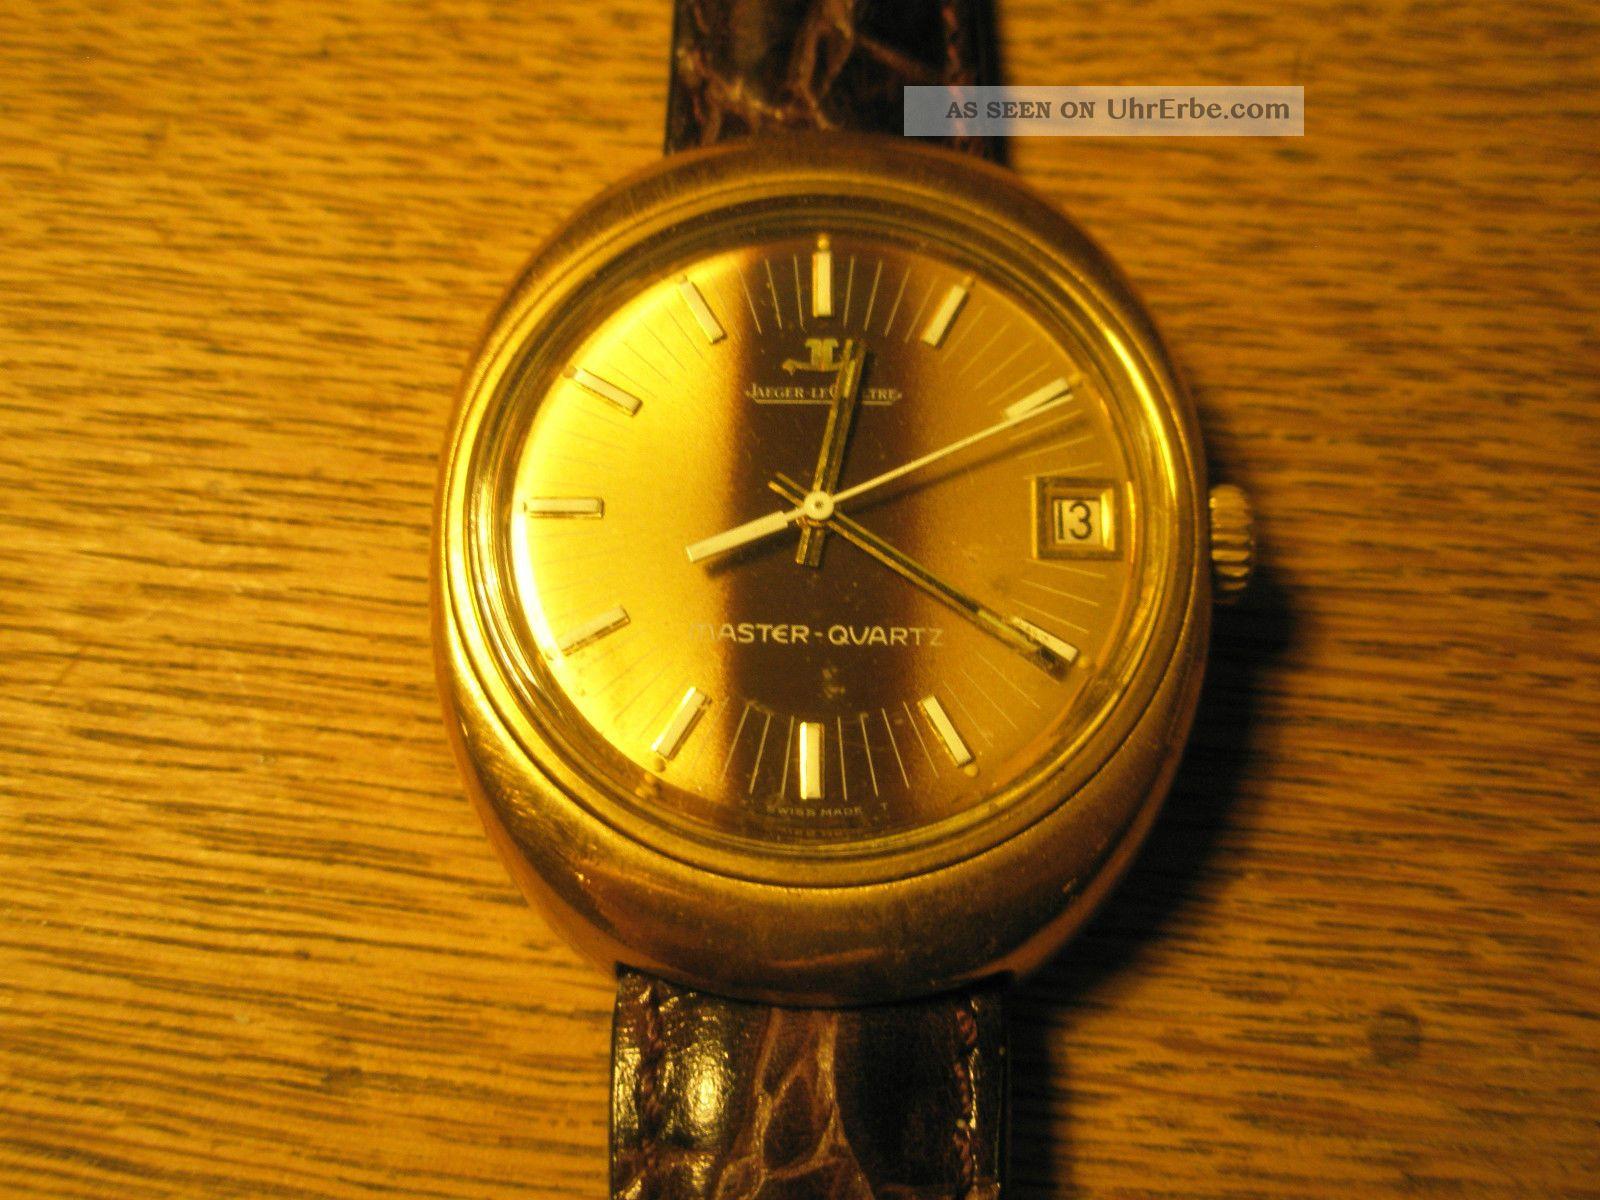 Frühe Jaeger Lecoultre Masterquartz Armbanduhren Bild